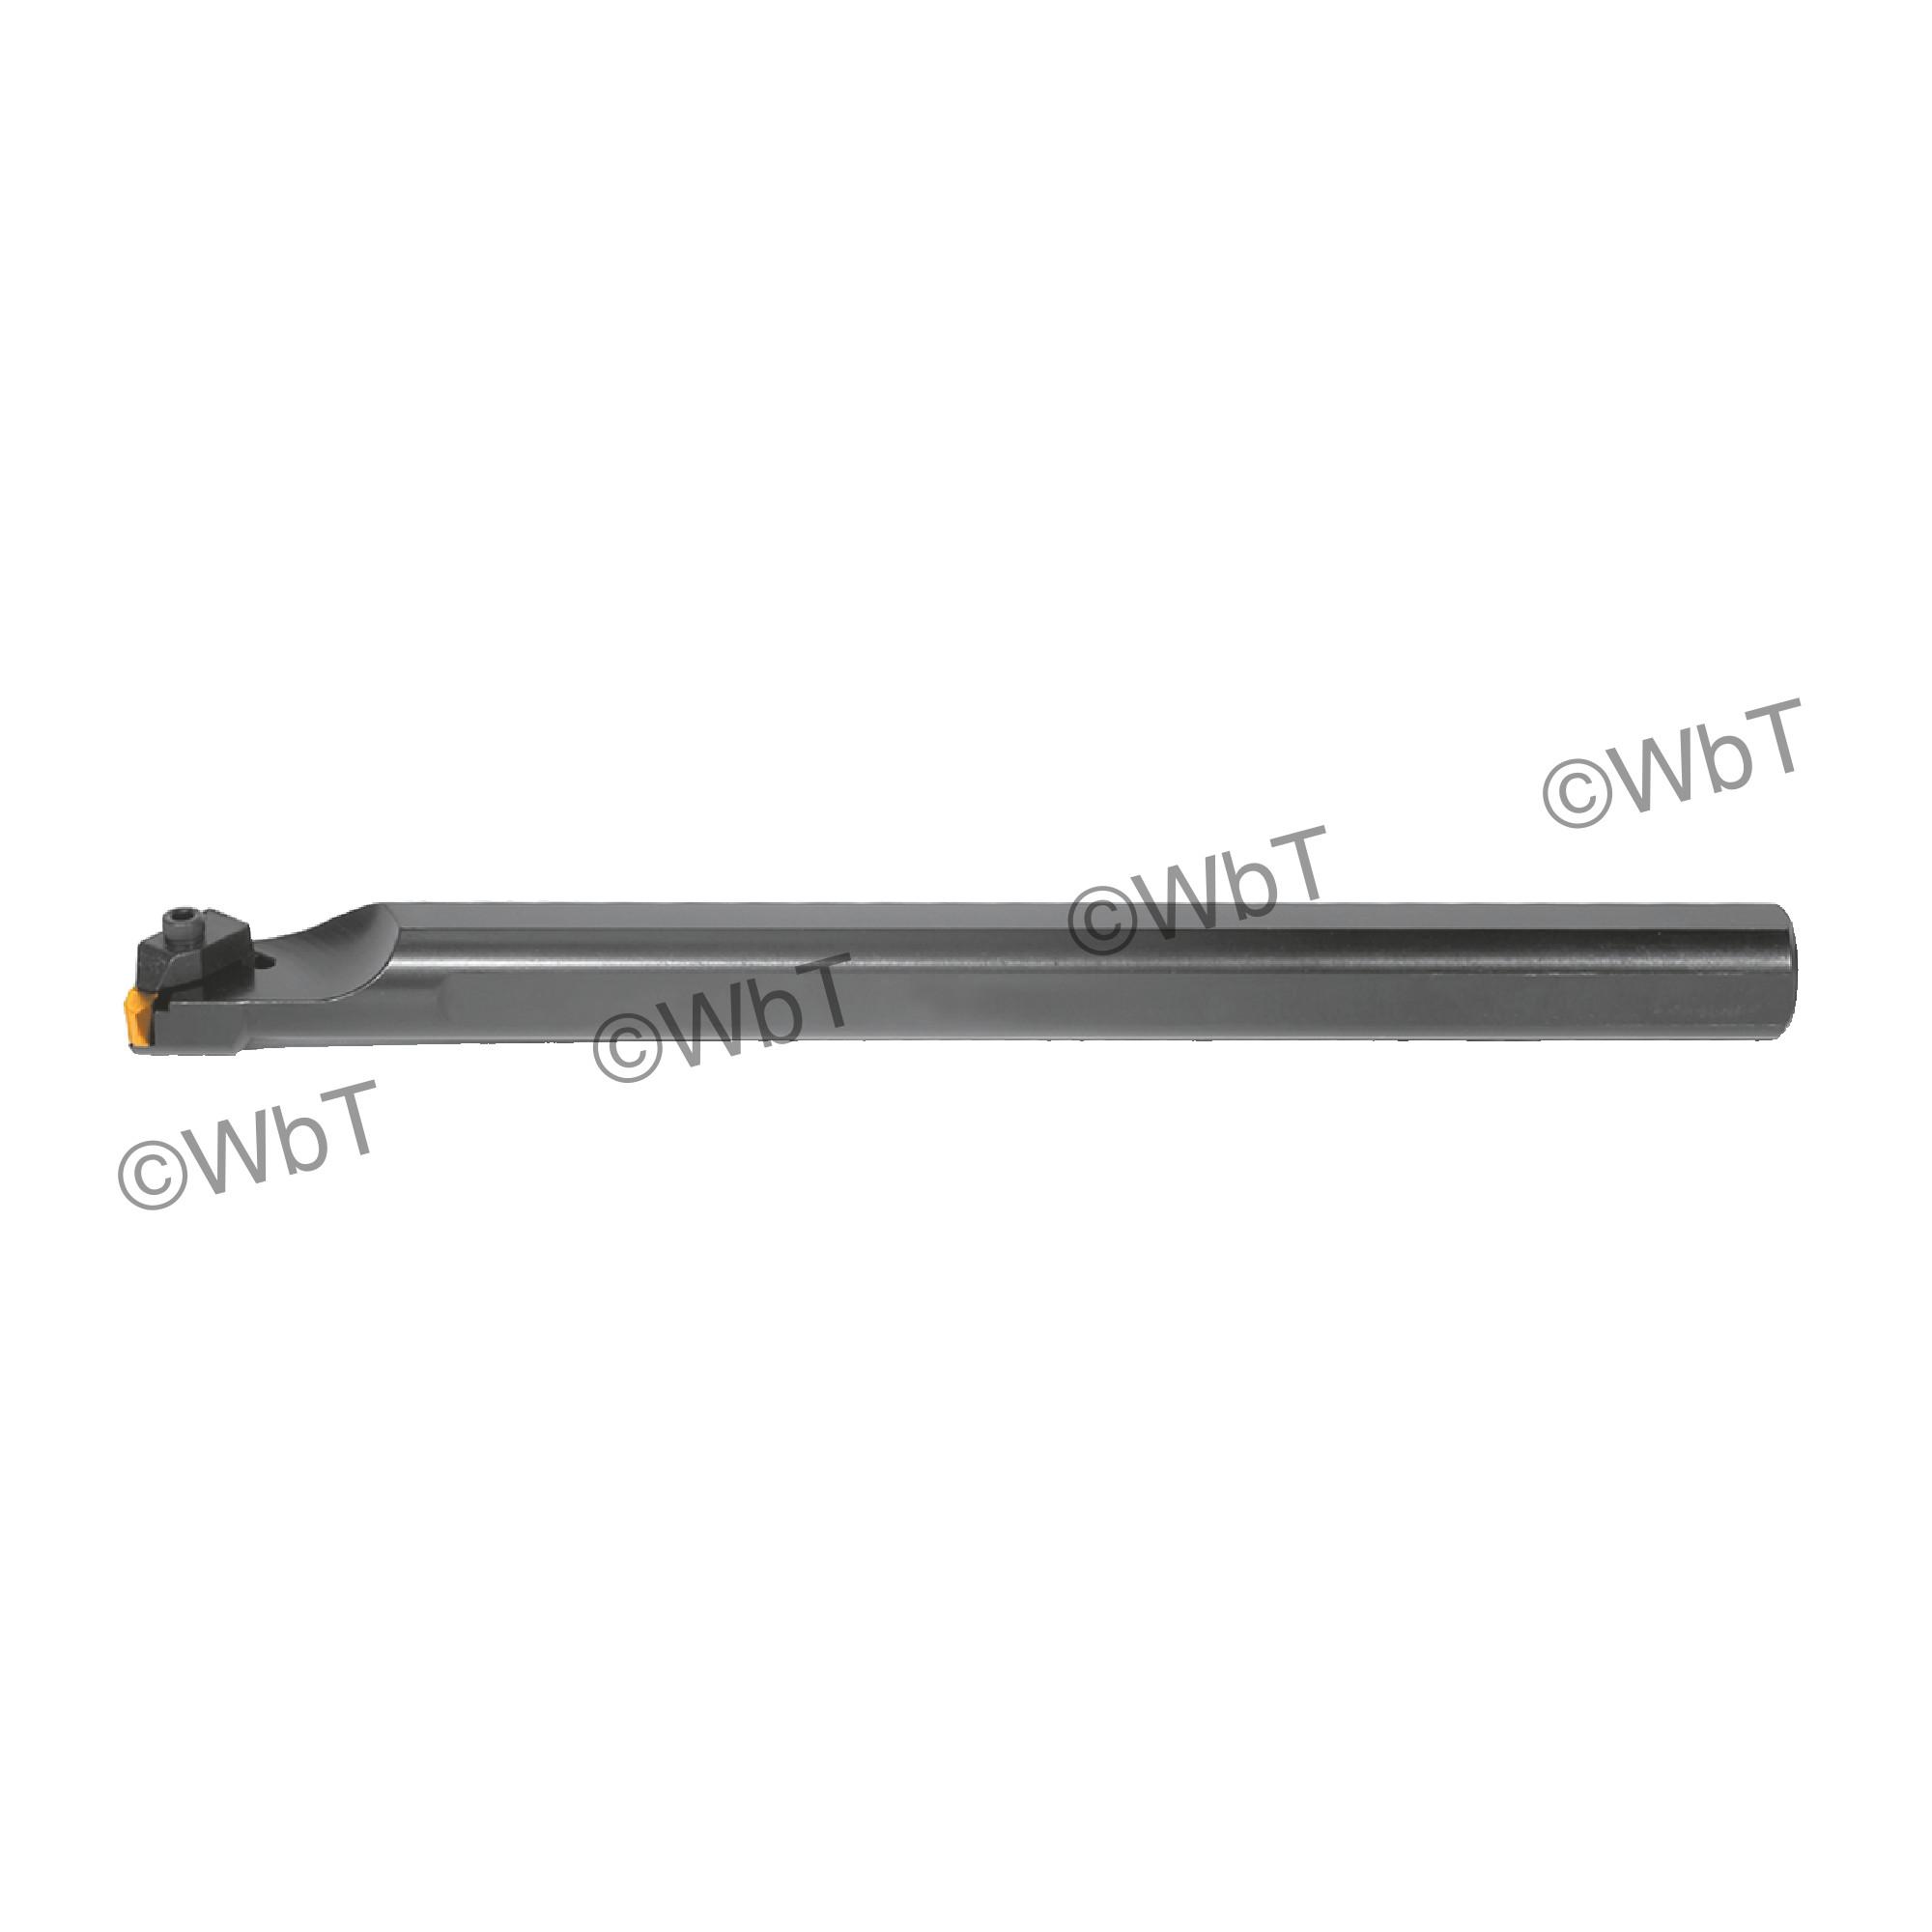 "TTC PRODUCTION - S10S-TNER-2 / 0.625"" Shank Diameter Boring Bar for Size 2 Inserts / Right Hand"